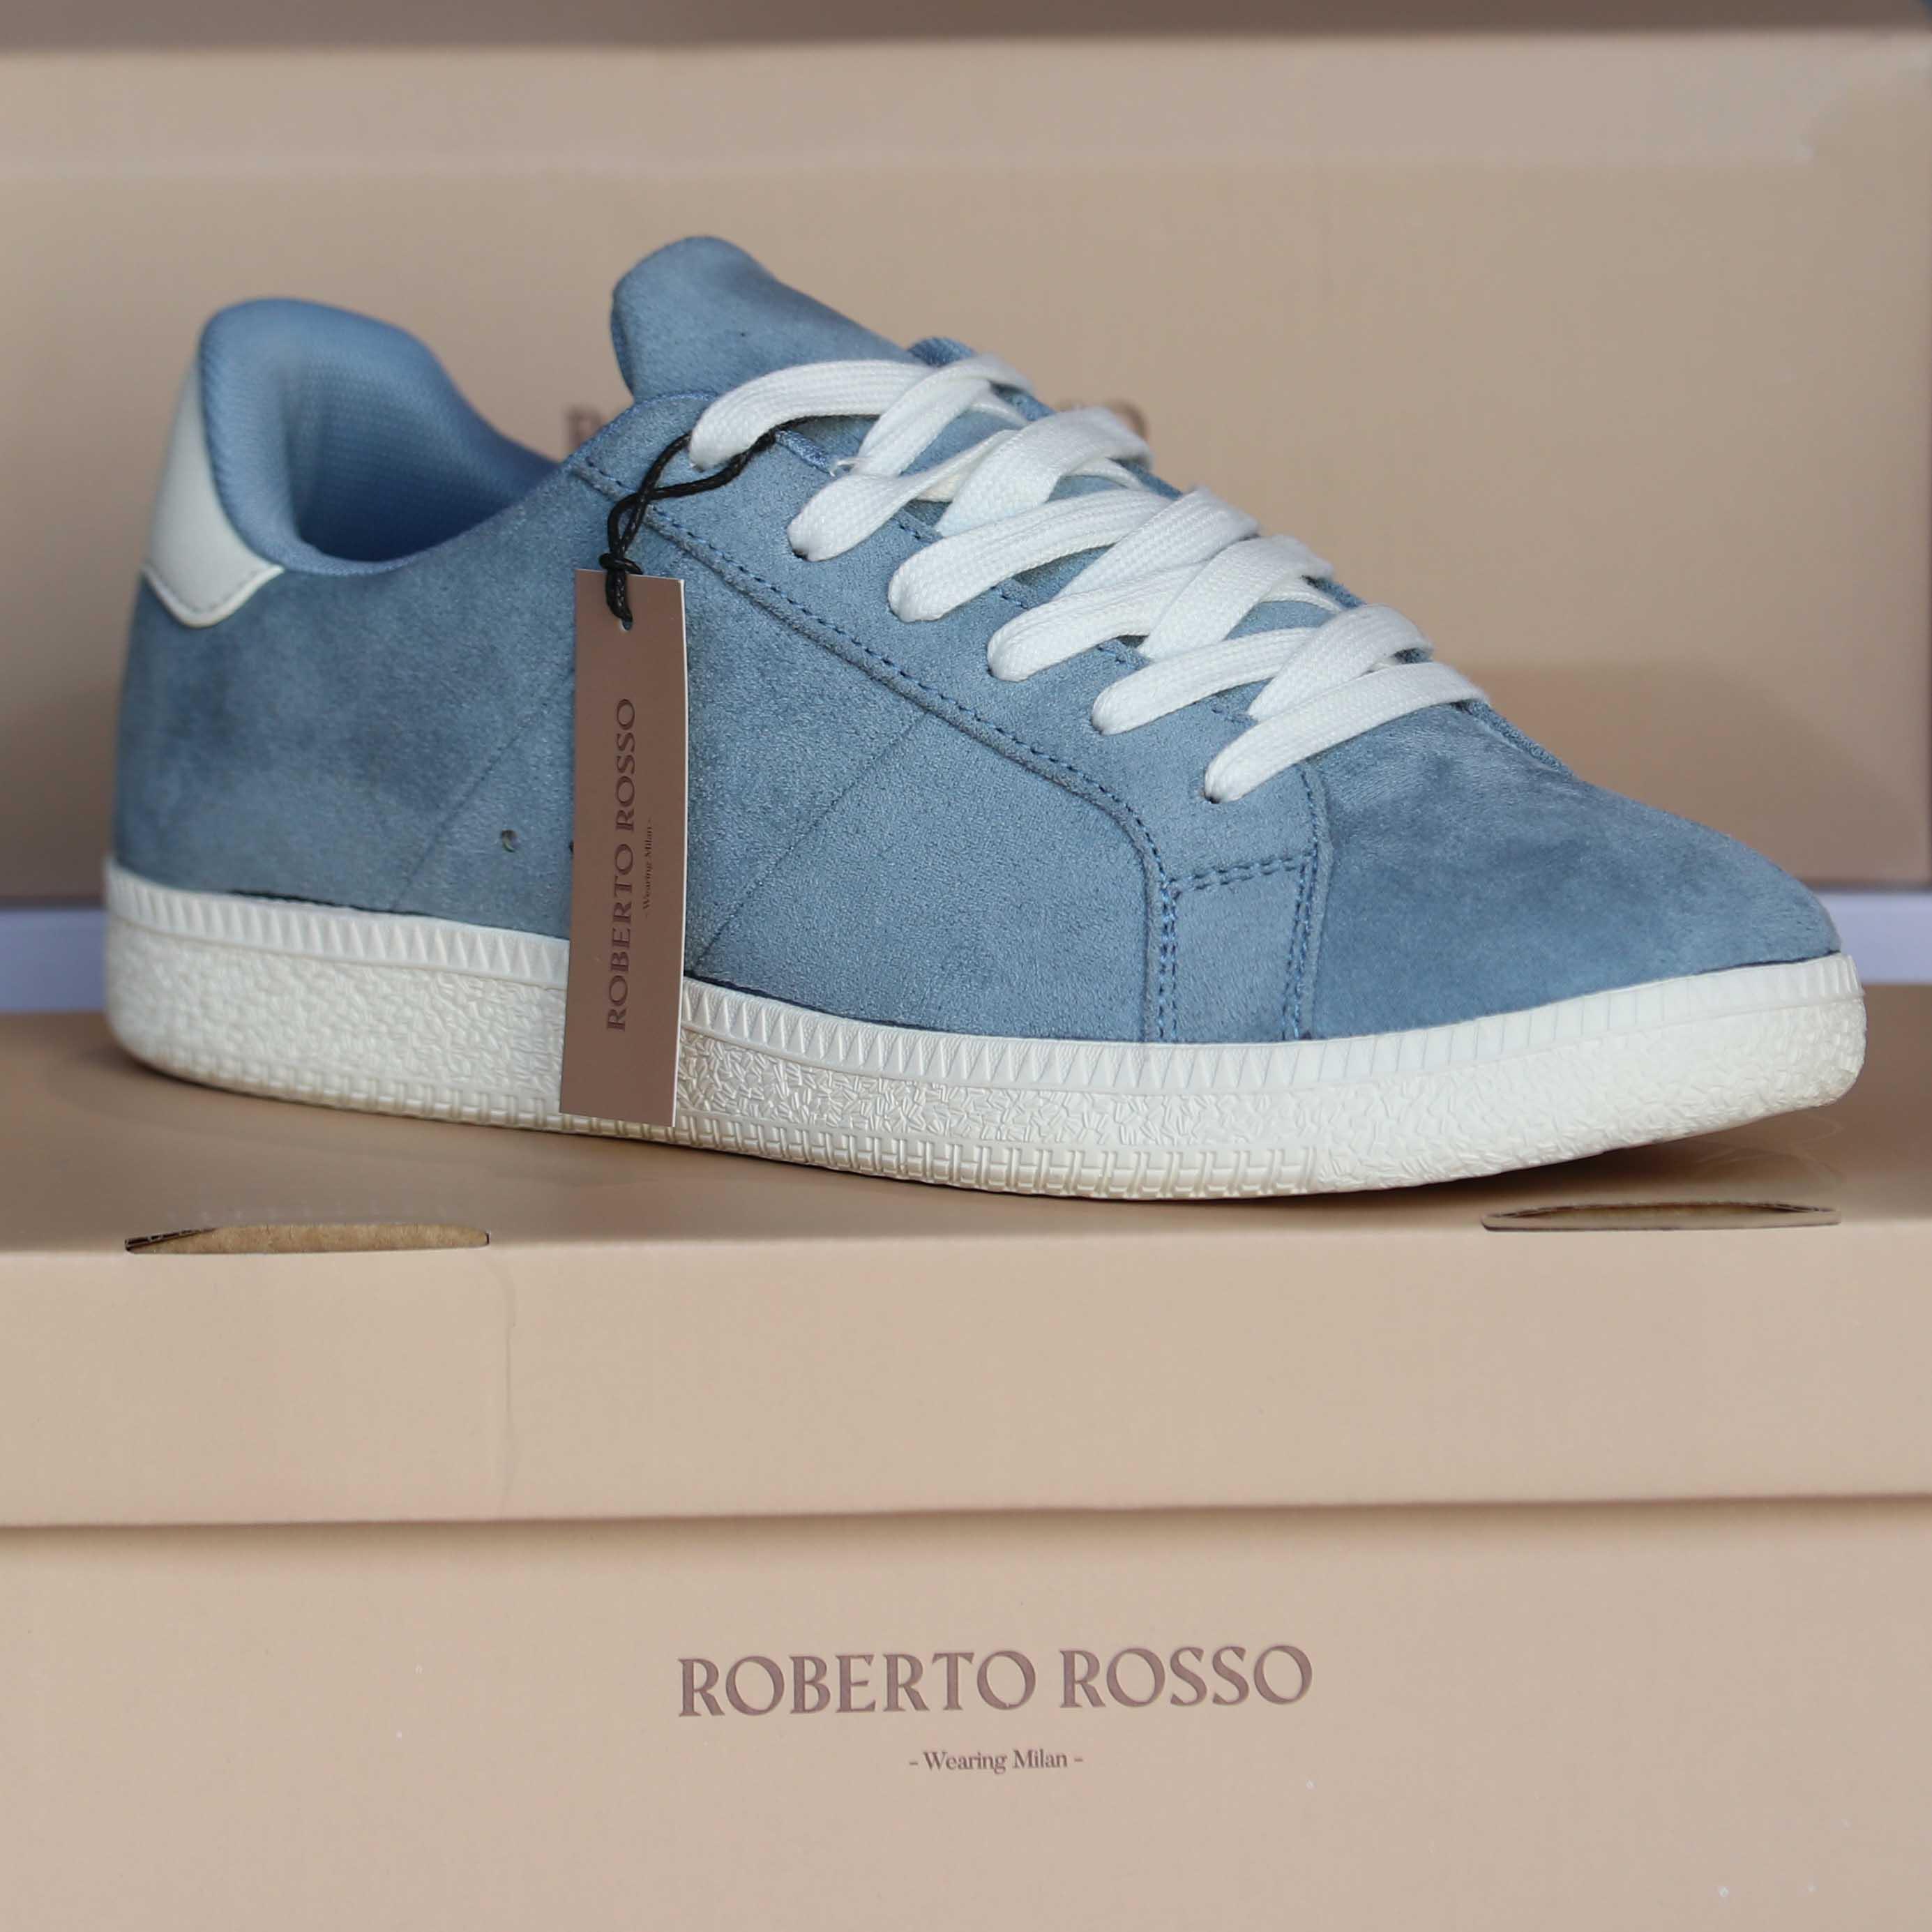 roberto rosso portiva blue sko sommer 5